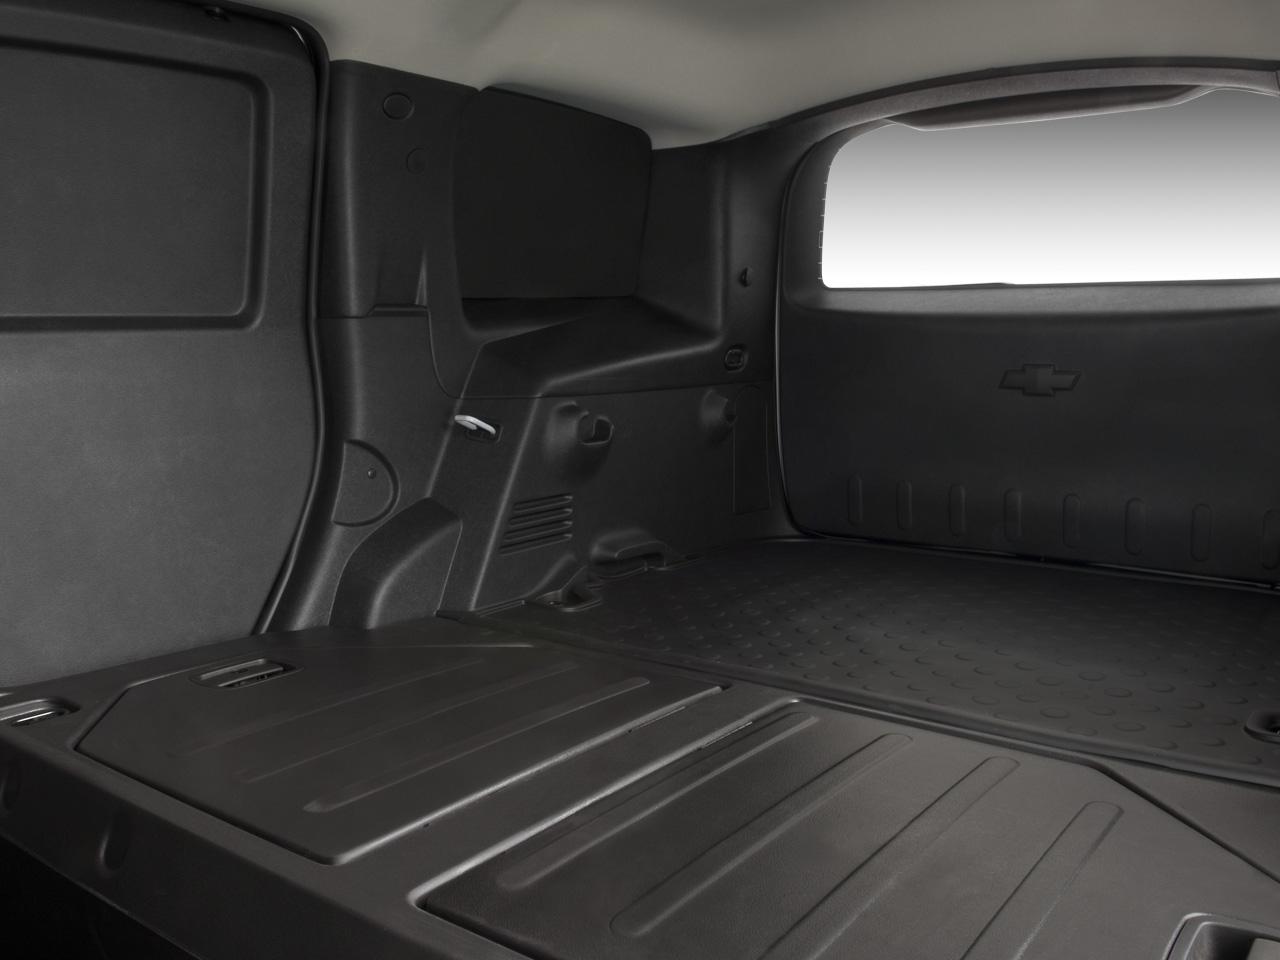 2009 Chevrolet HHR Panel LT - Chevy Wagon Review - Automobile Magazine